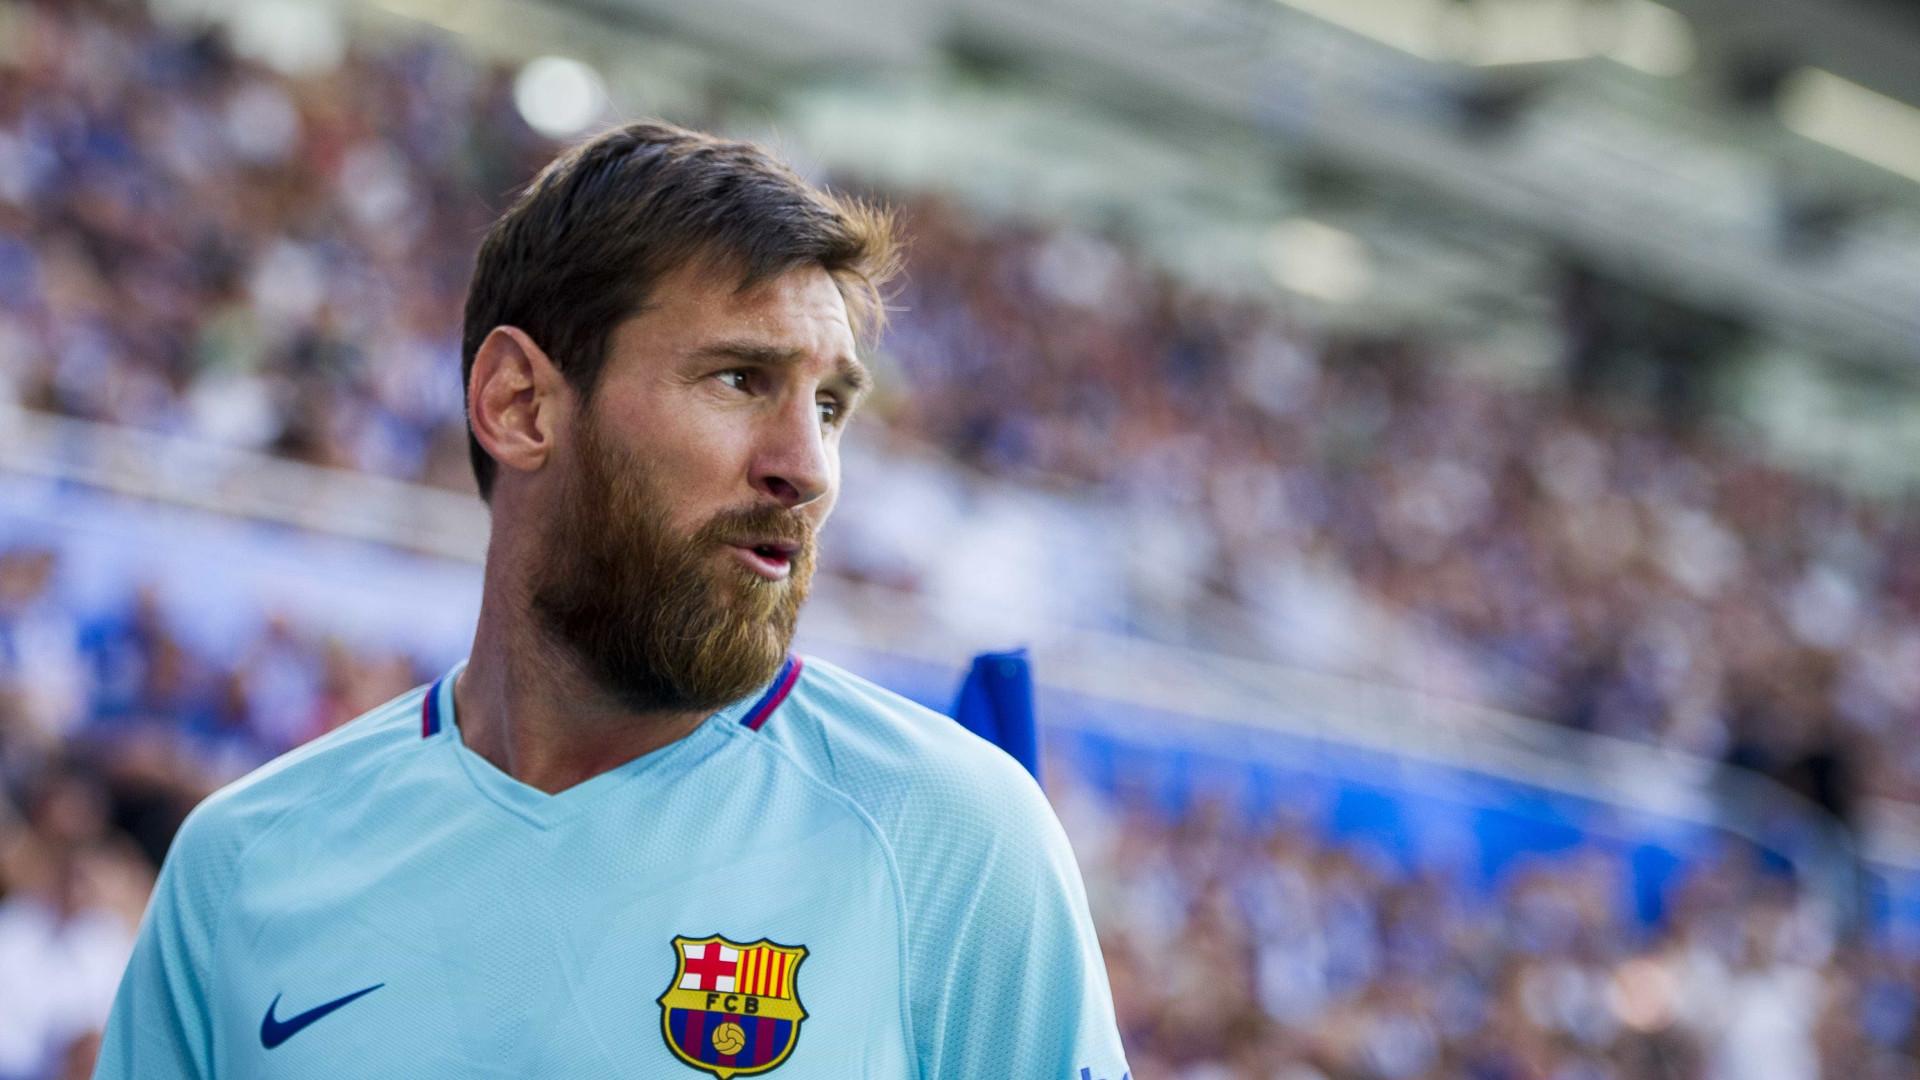 O fisco voltou a bater à porta de Lionel Messi